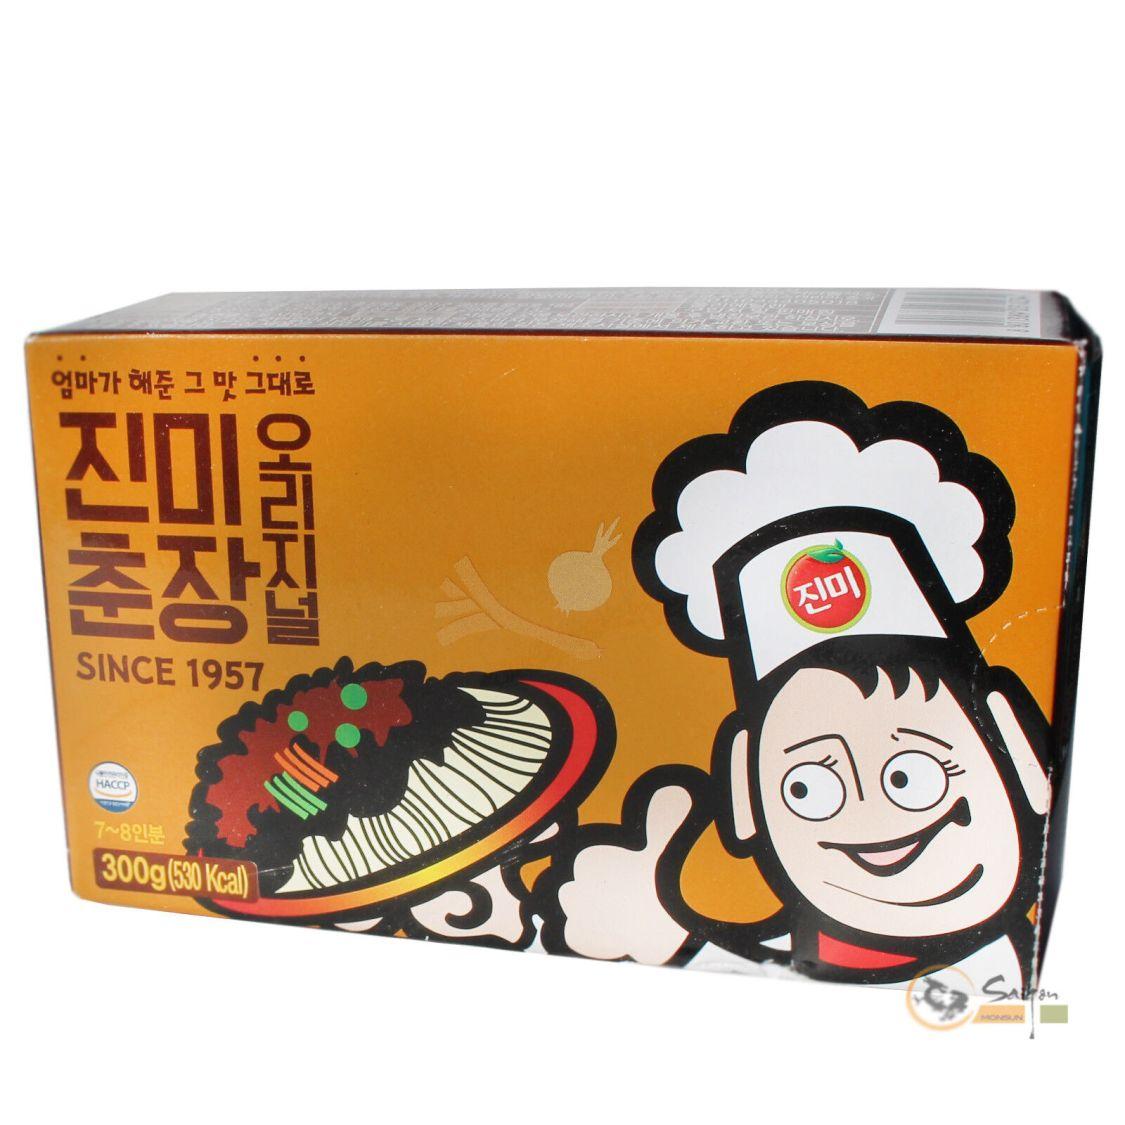 Jinmi Jjajang Koreanische schwarze Bohnen Black Bean Sauce 300g Chajang Korea